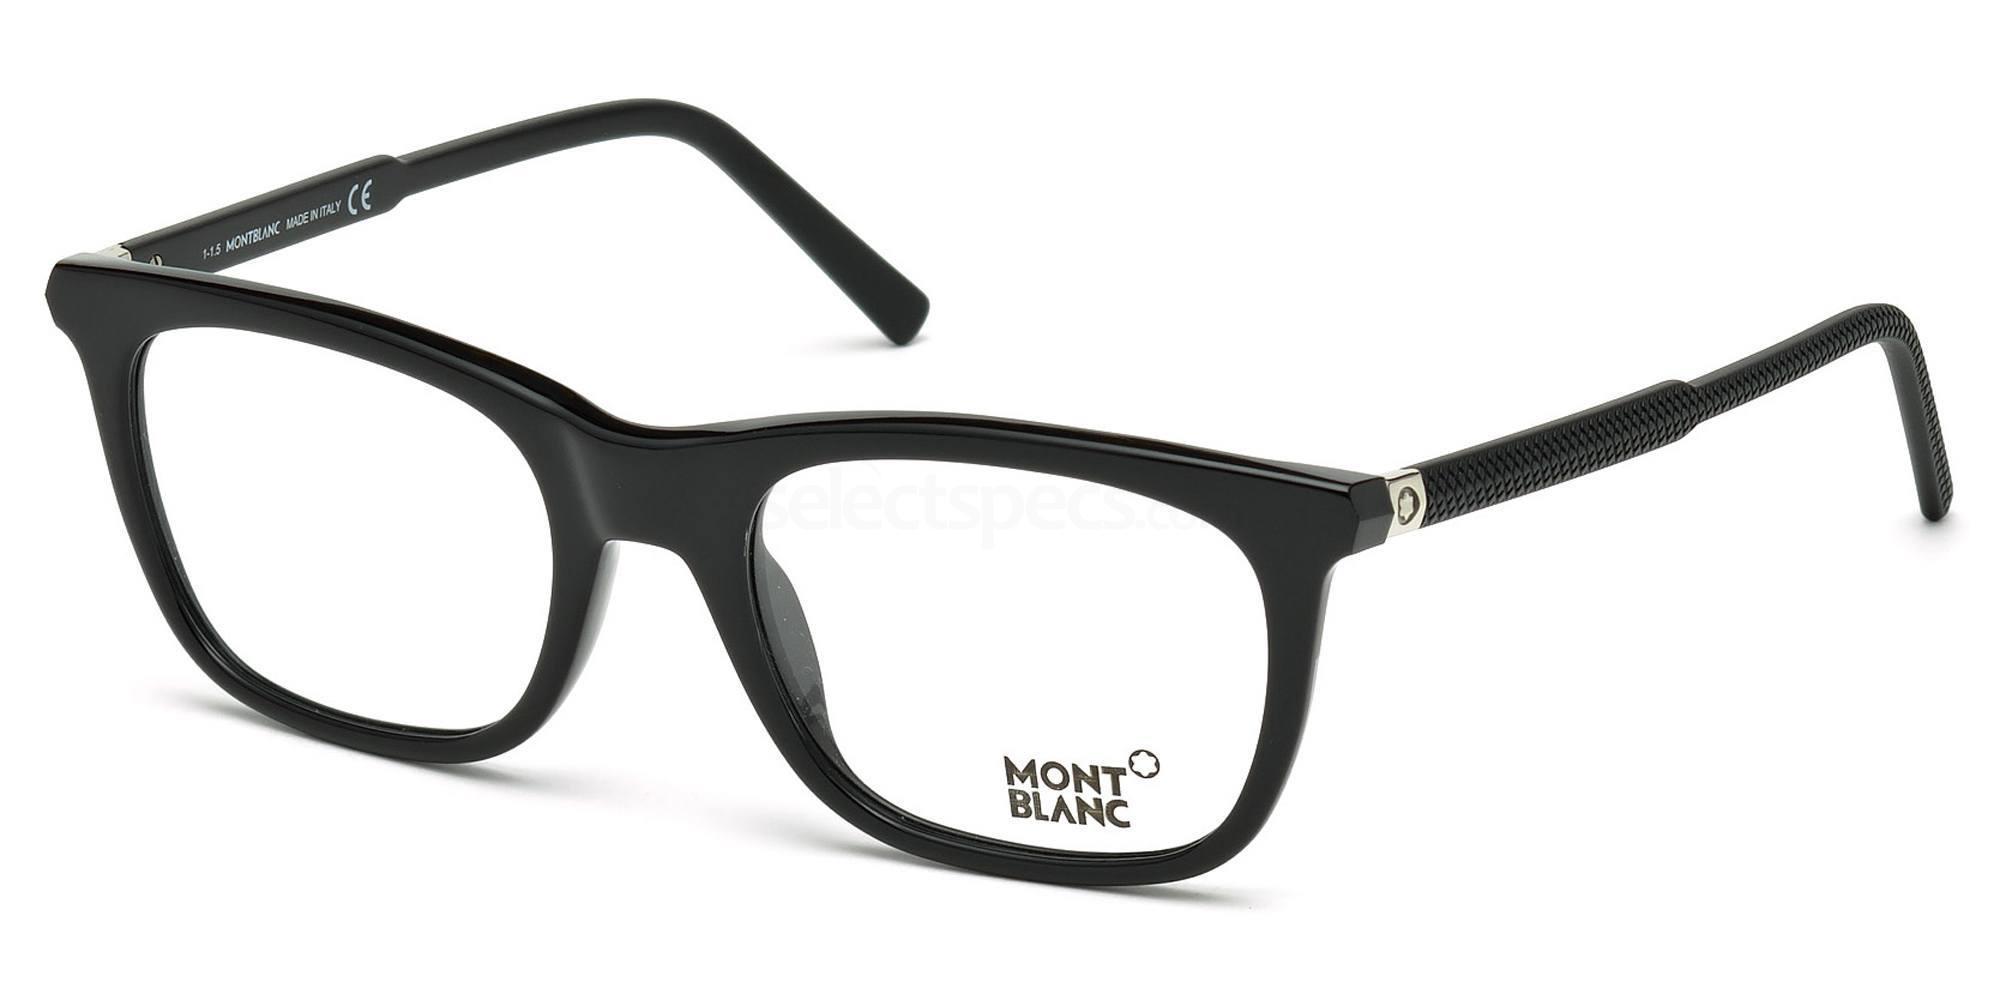 005 MB0610 Glasses, Mont Blanc